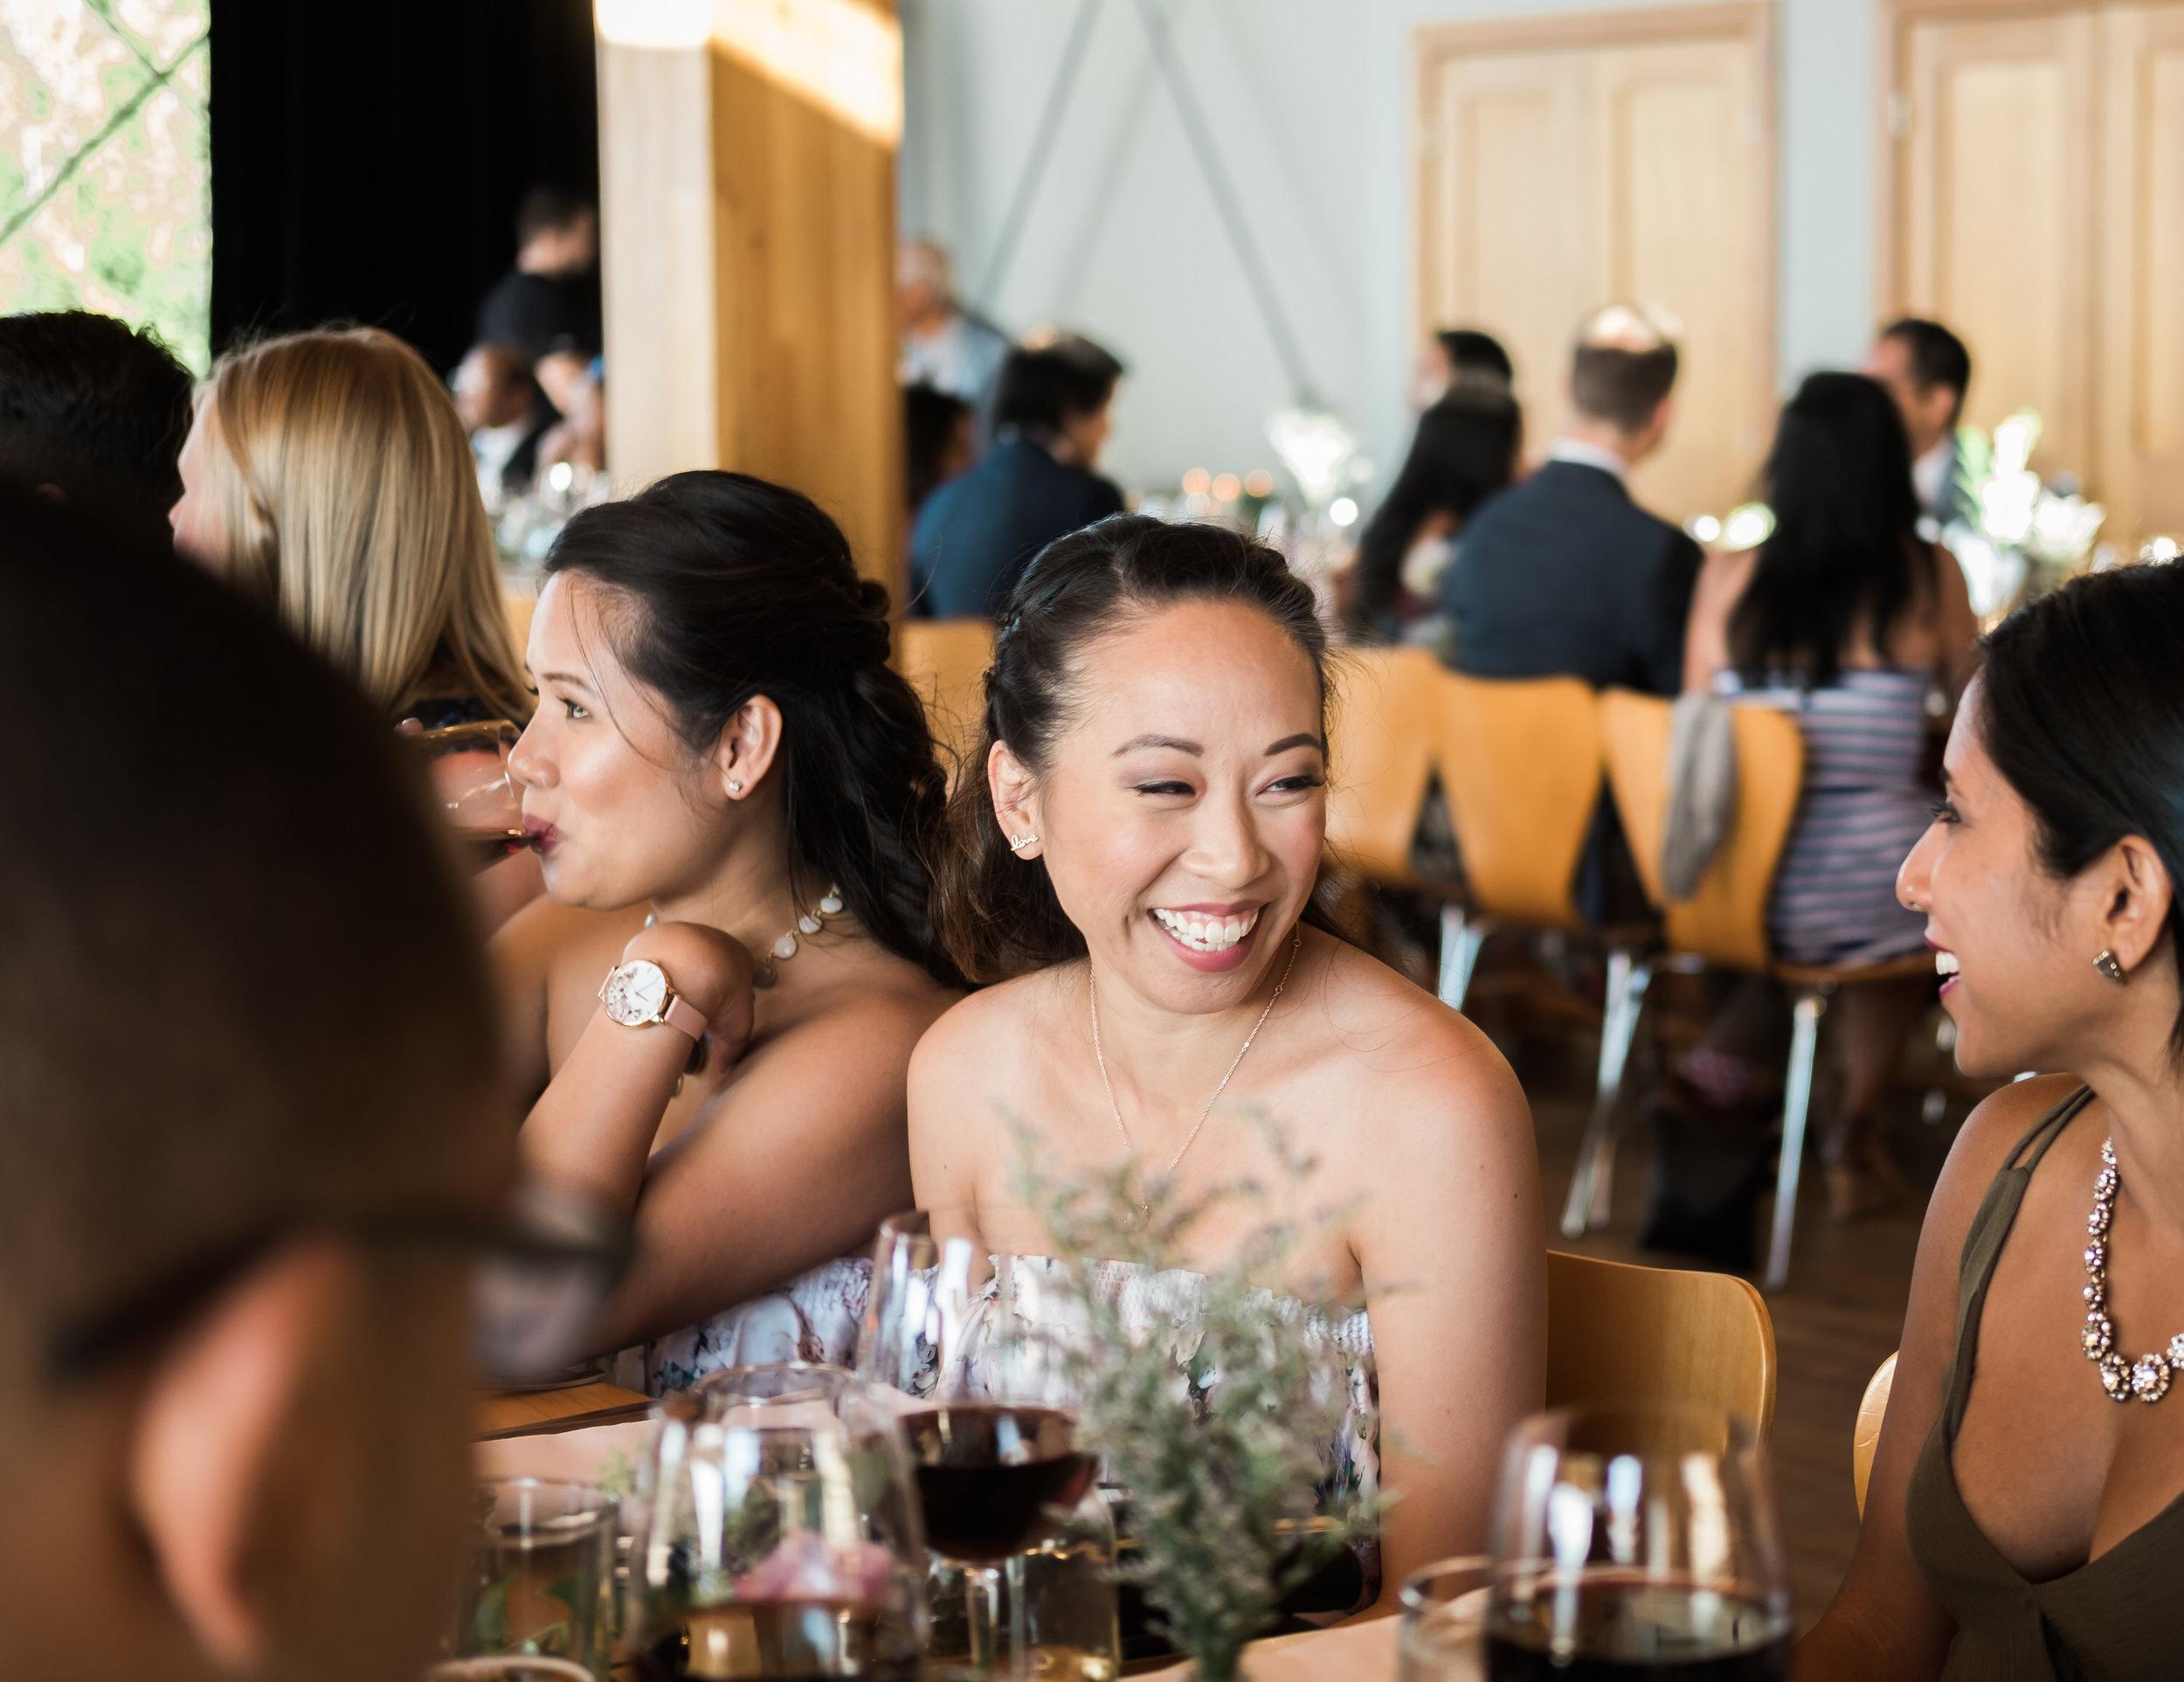 Squamish Wedding Photographer - Sea to Sky Gondola Wedding Photos -  Vancouver Wedding Photographer & Videographer - Sunshine Coast Wedding Photos - Sunshine Coast Wedding Photographer - Jennifer Picard Photography - DSCF7930.jpg